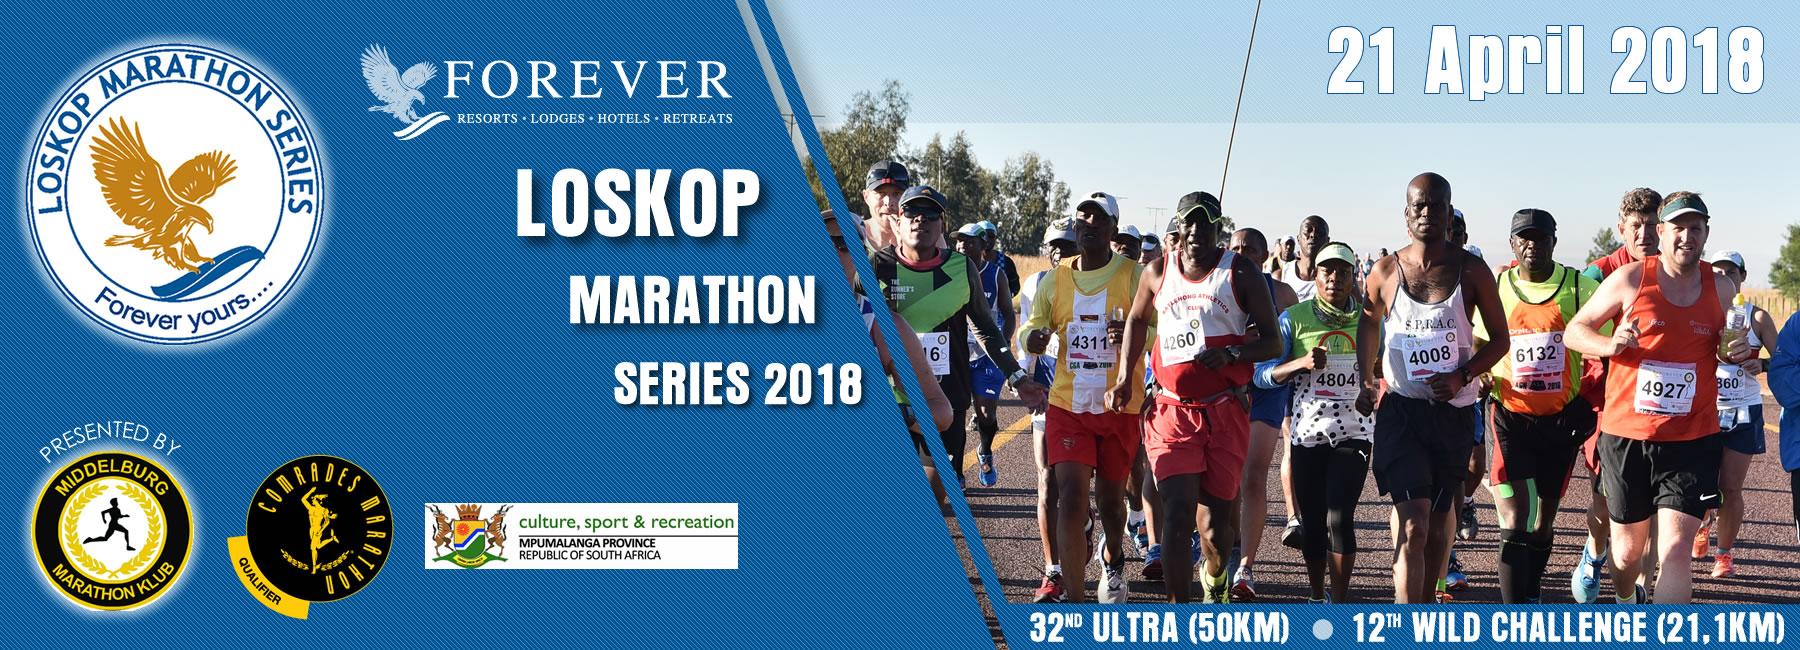 Forever Resorts Loskop Marathon Series 2018